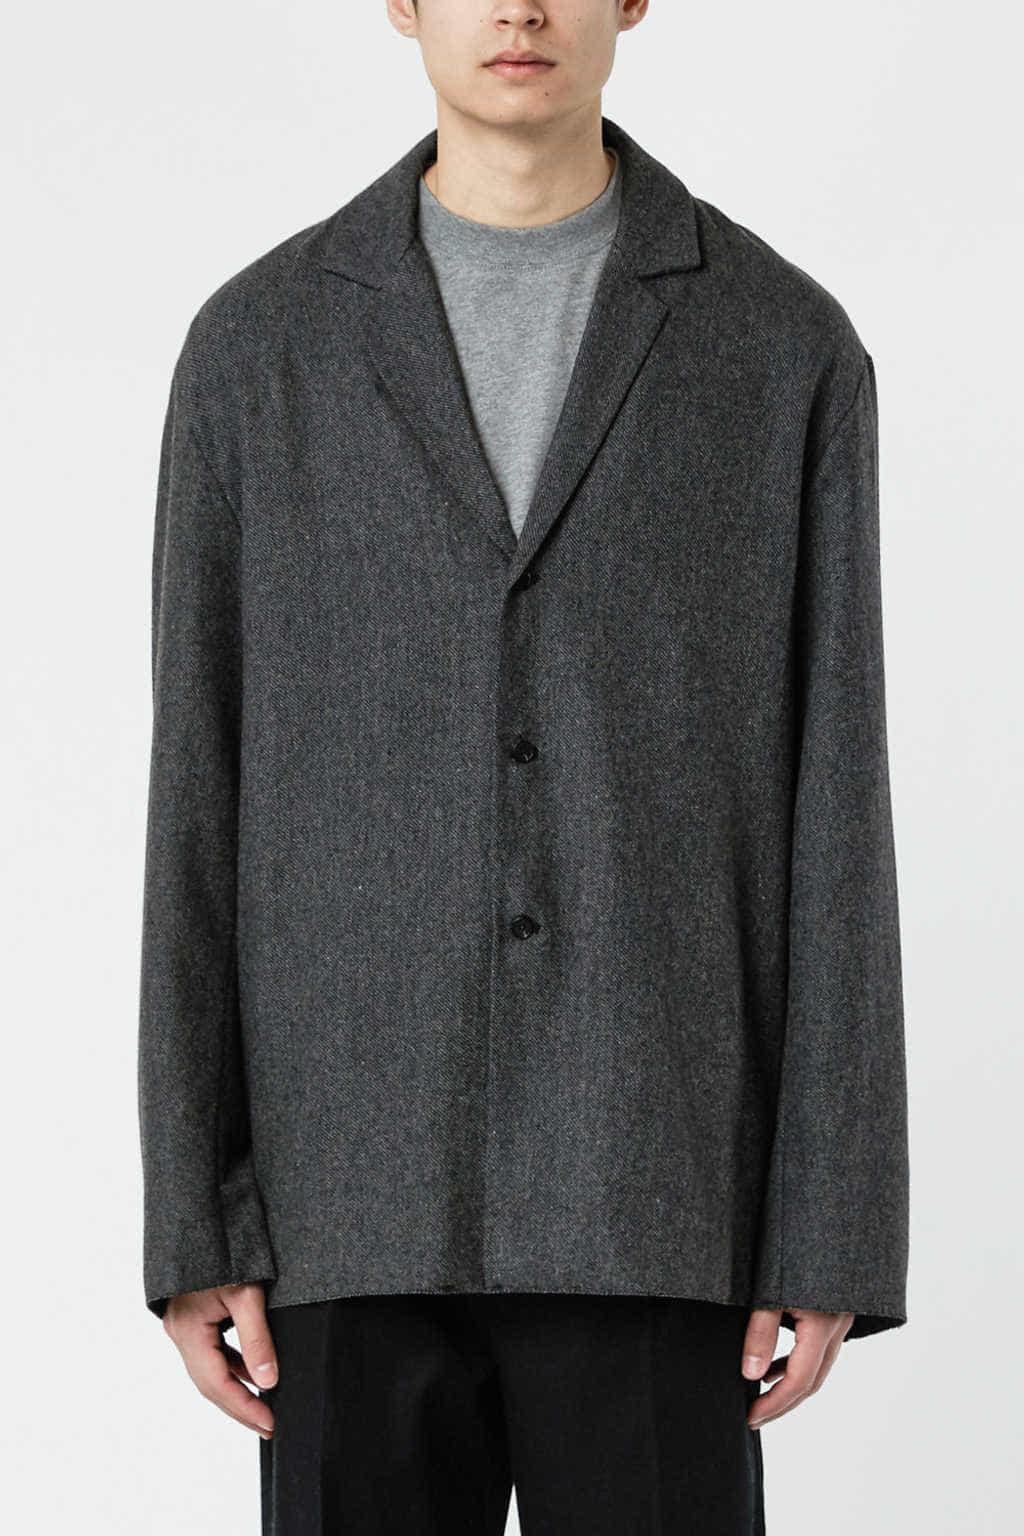 Jacket J002M Gray 1